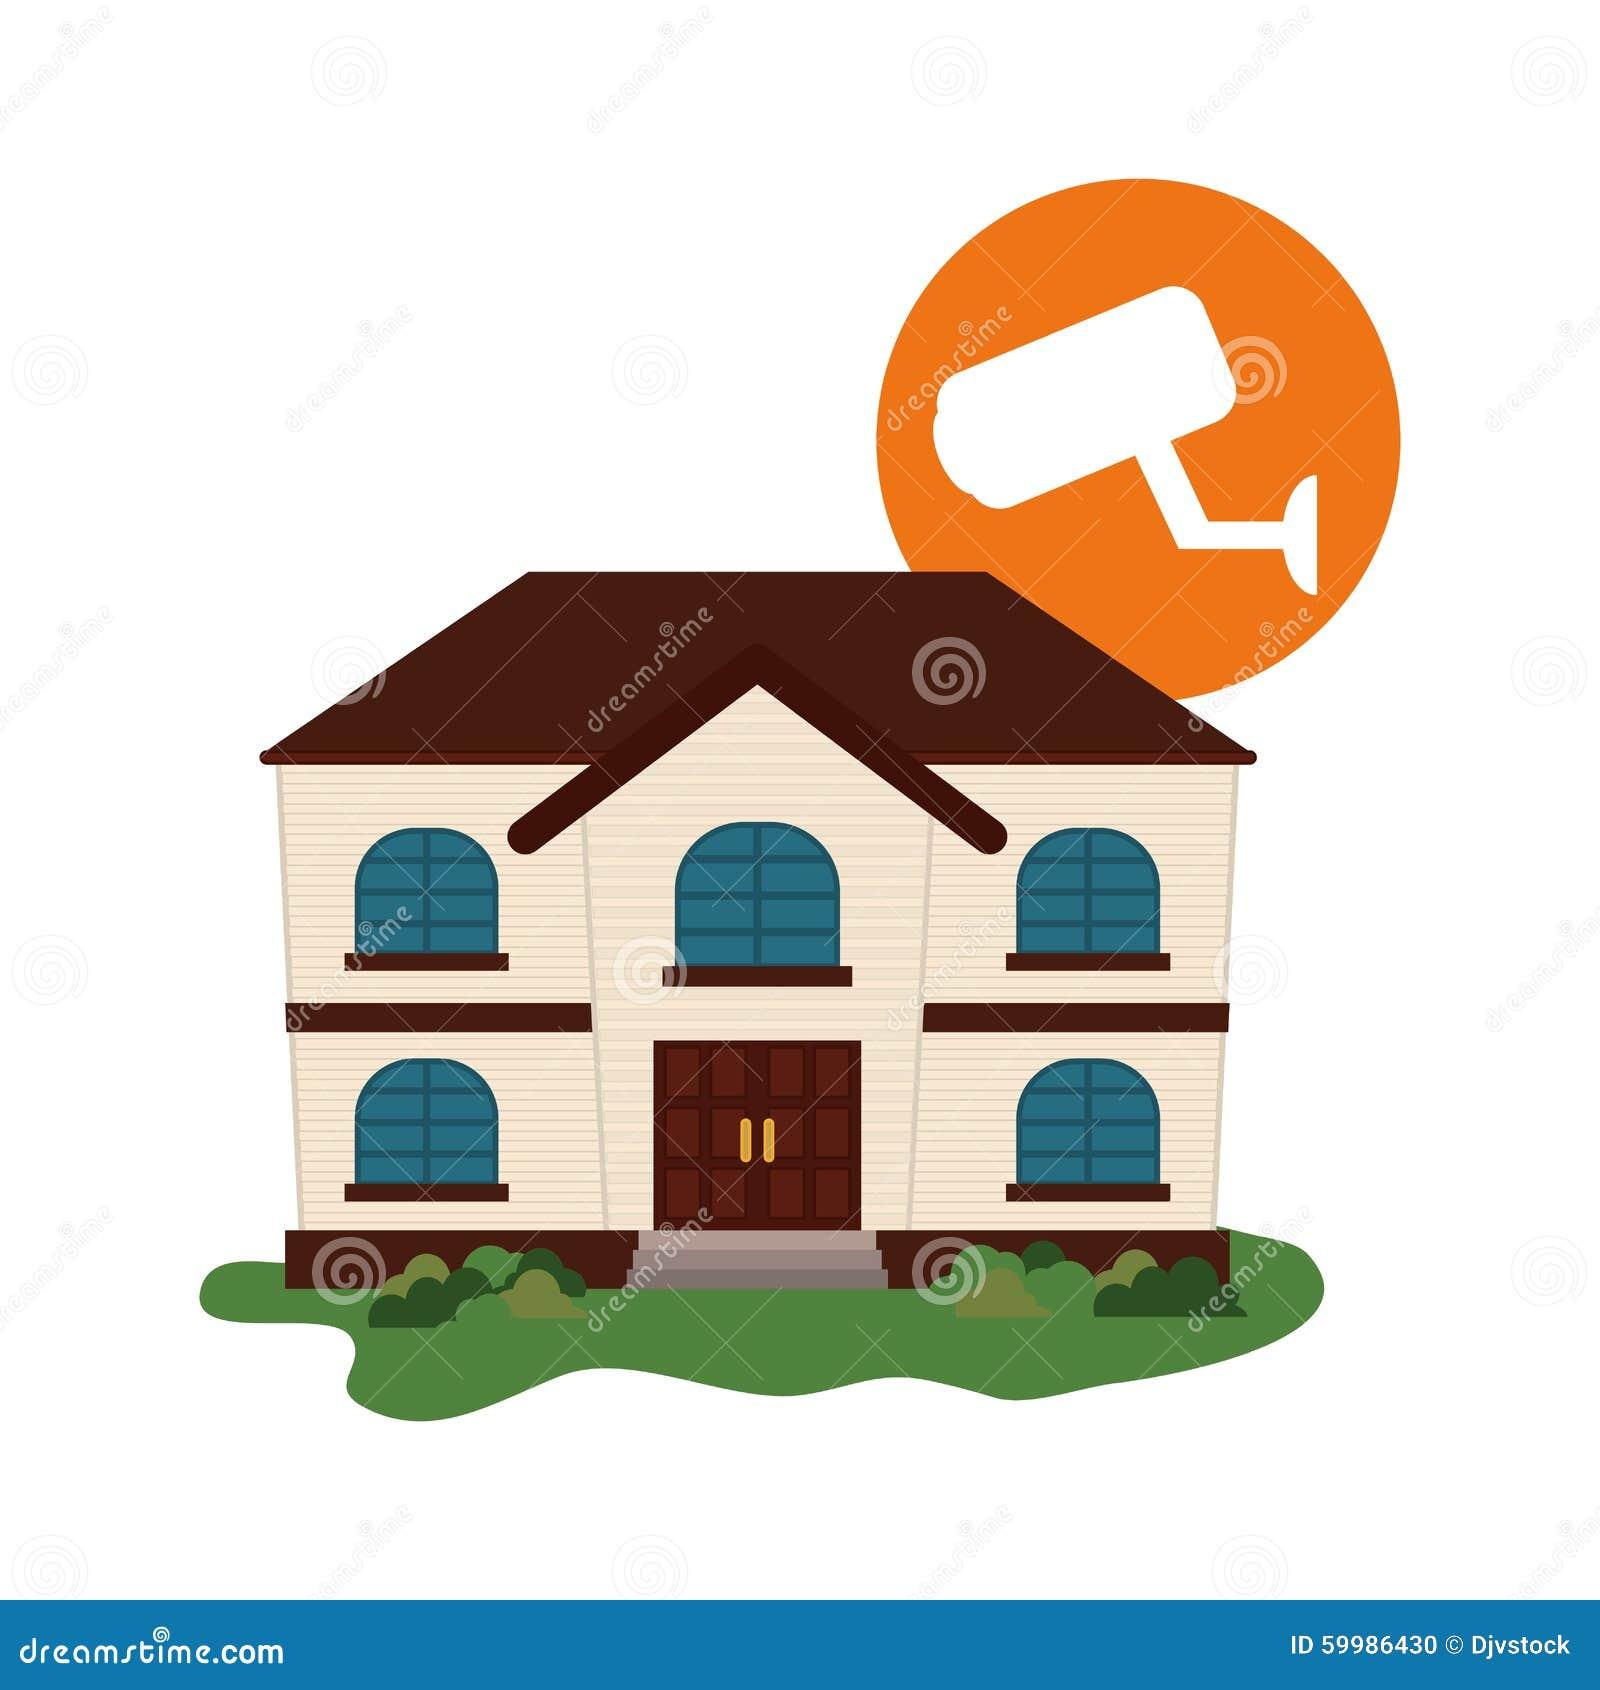 Home insurance design stock vector. Illustration of cctv ...